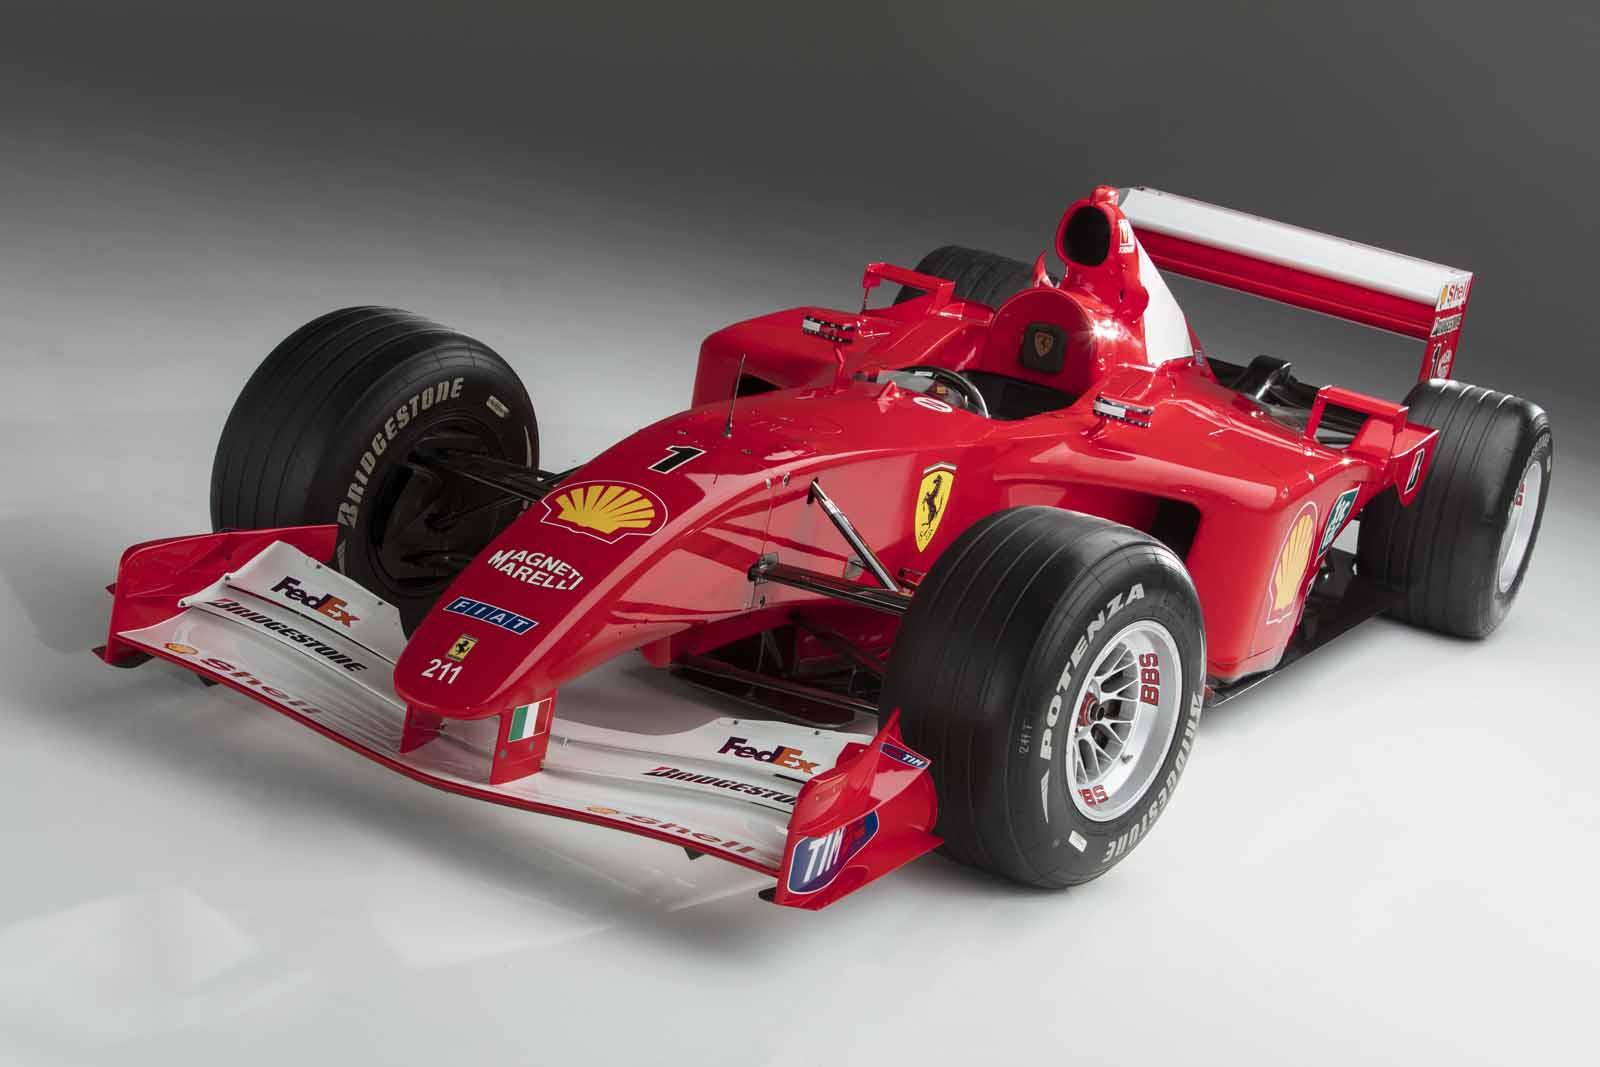 Michael Schumacher's Ferrari F2001 to Fetch Over $4M at Auction